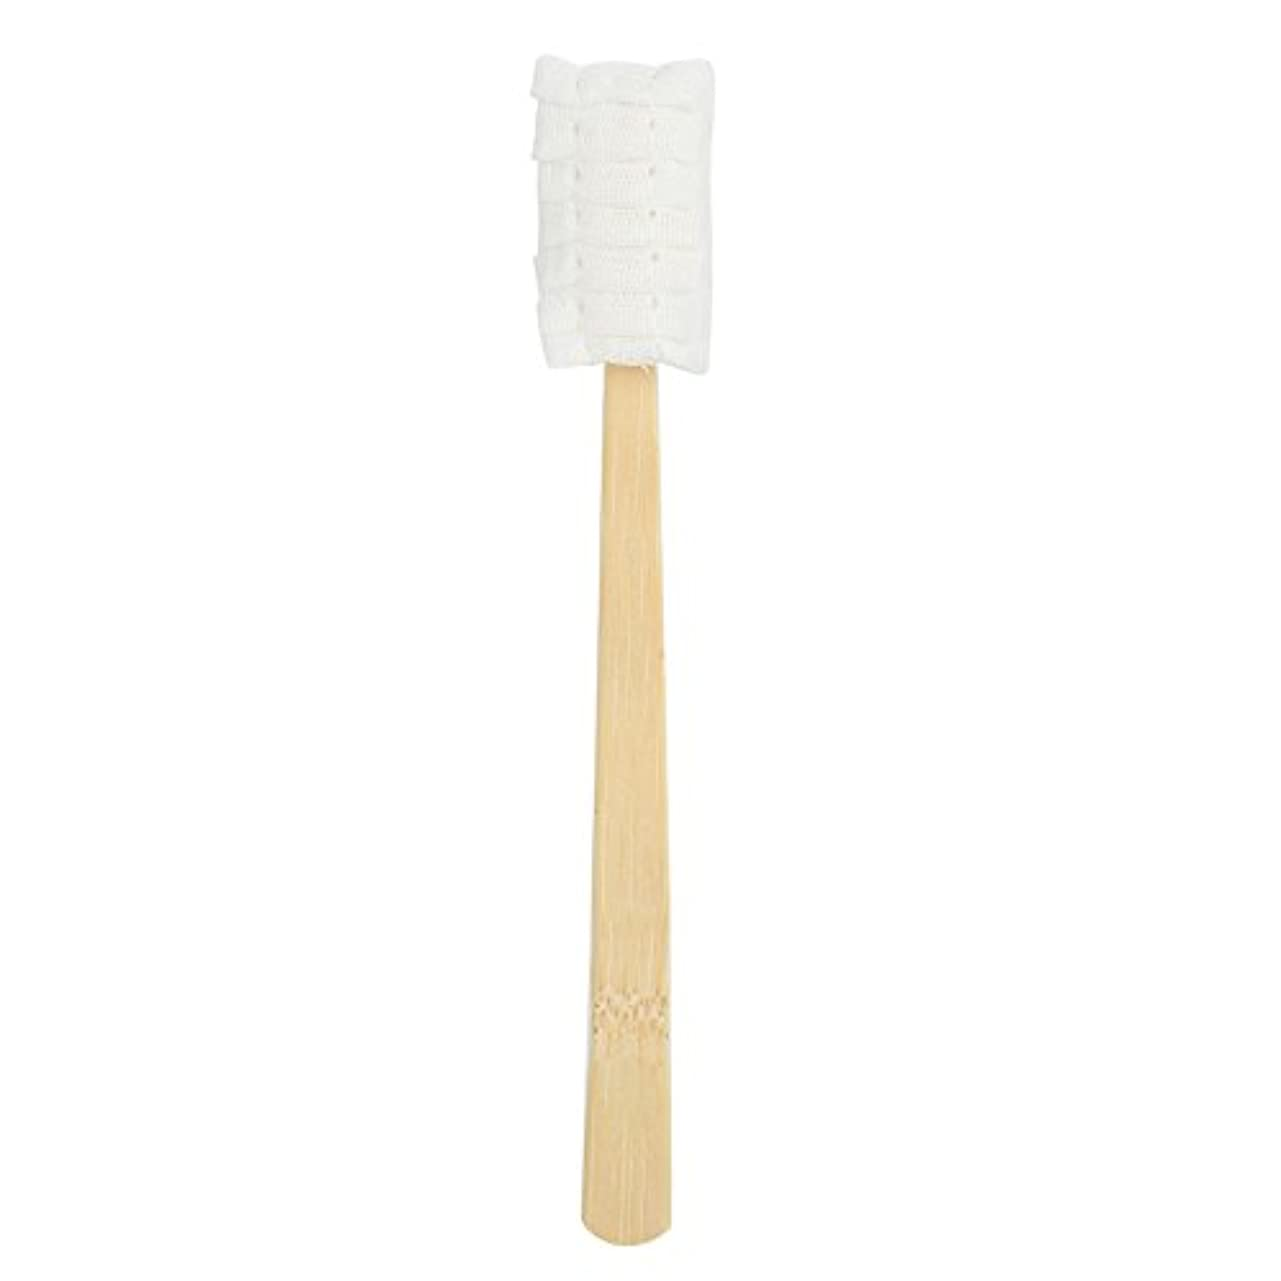 30pcs使い捨てマタニティソフトガーゼ歯ブラシ